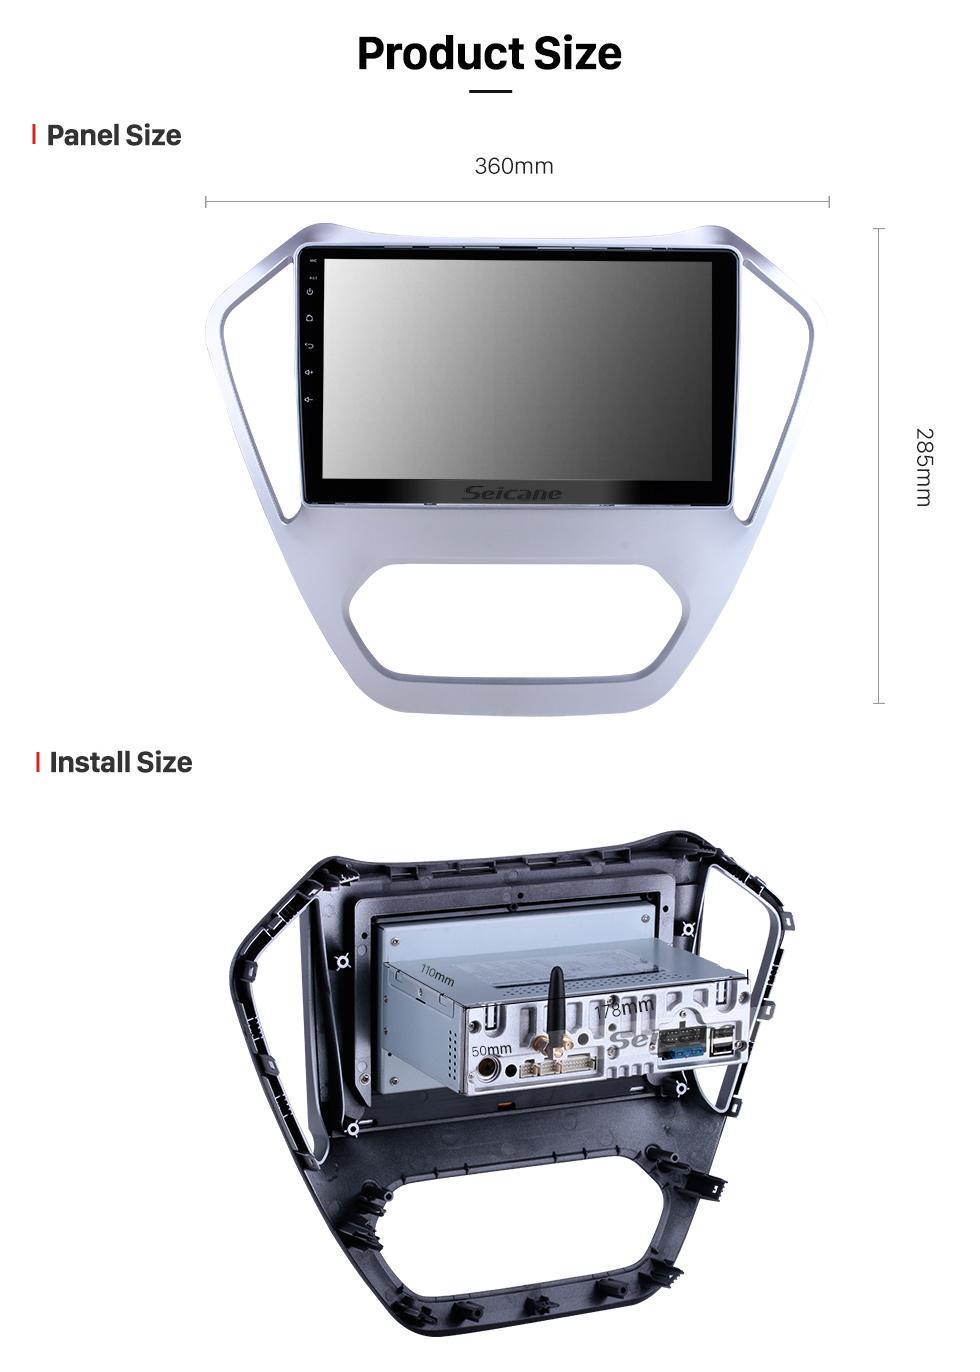 Seicane Android 10.0 para 2014 2015 2016 MG GT Radio 10.1 pulgadas Sistema de navegación GPS Bluetooth HD Pantalla táctil Carplay compatible DSP SWC